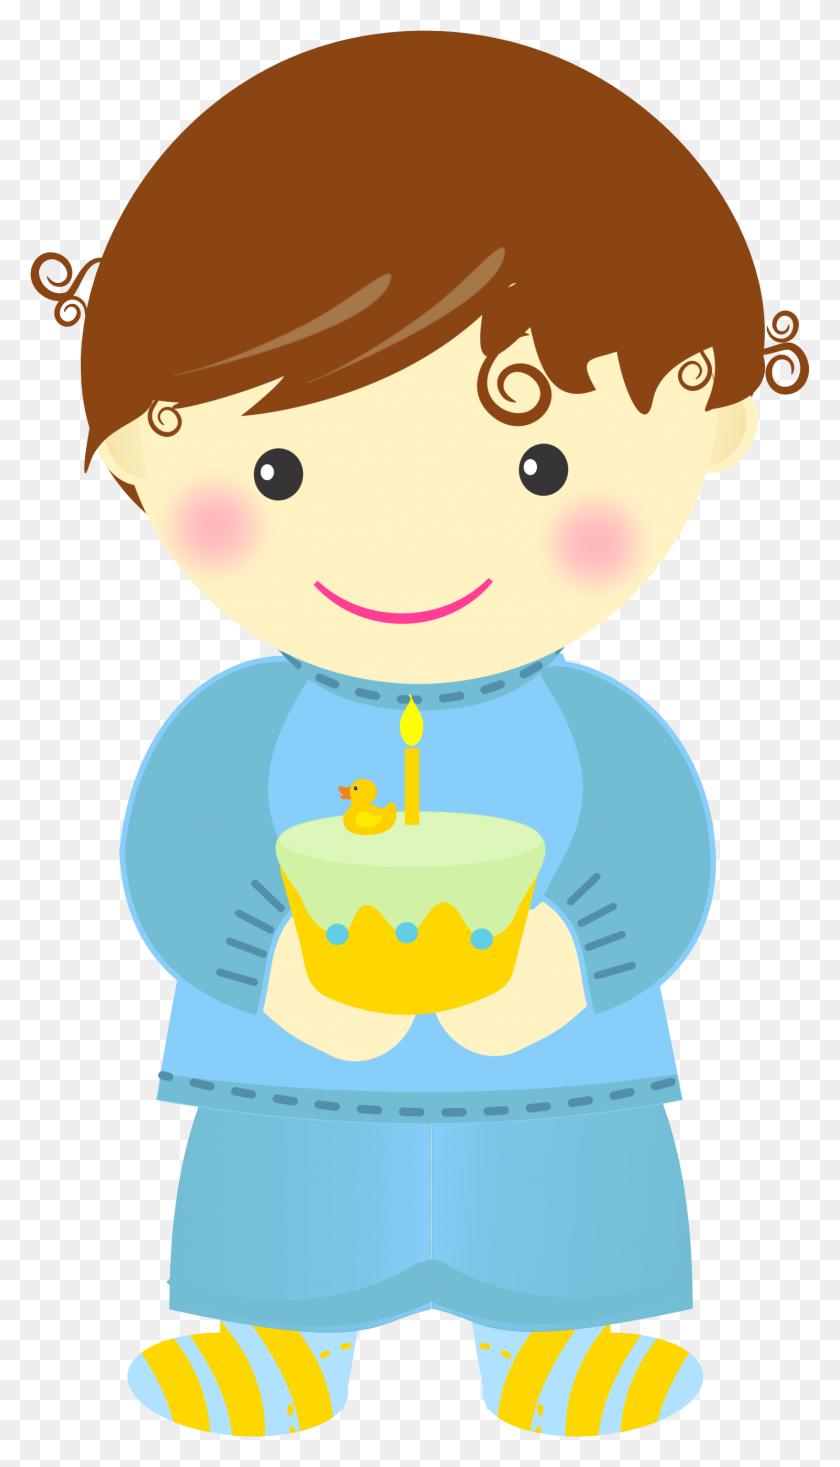 Baby's First Birthday Clip Art - Fall Birthday Clipart